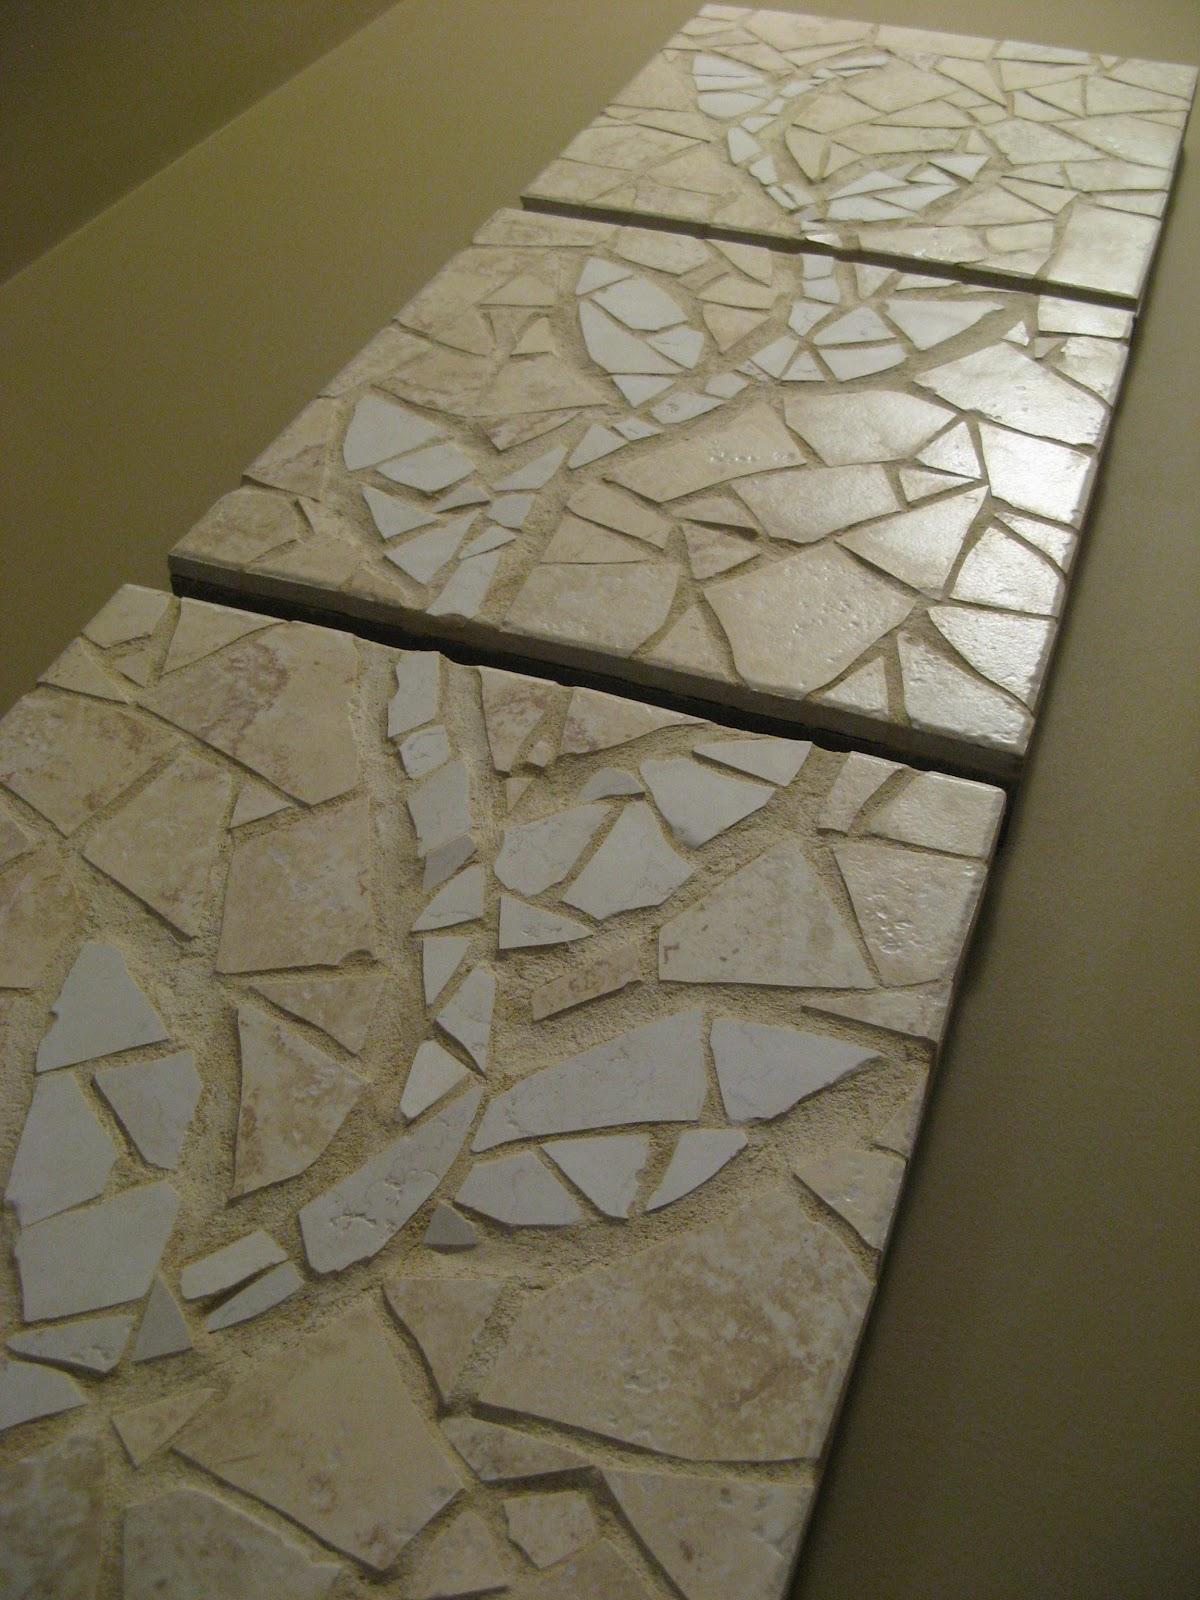 Susan Snyder: MOSAIC WALL ART PANELS